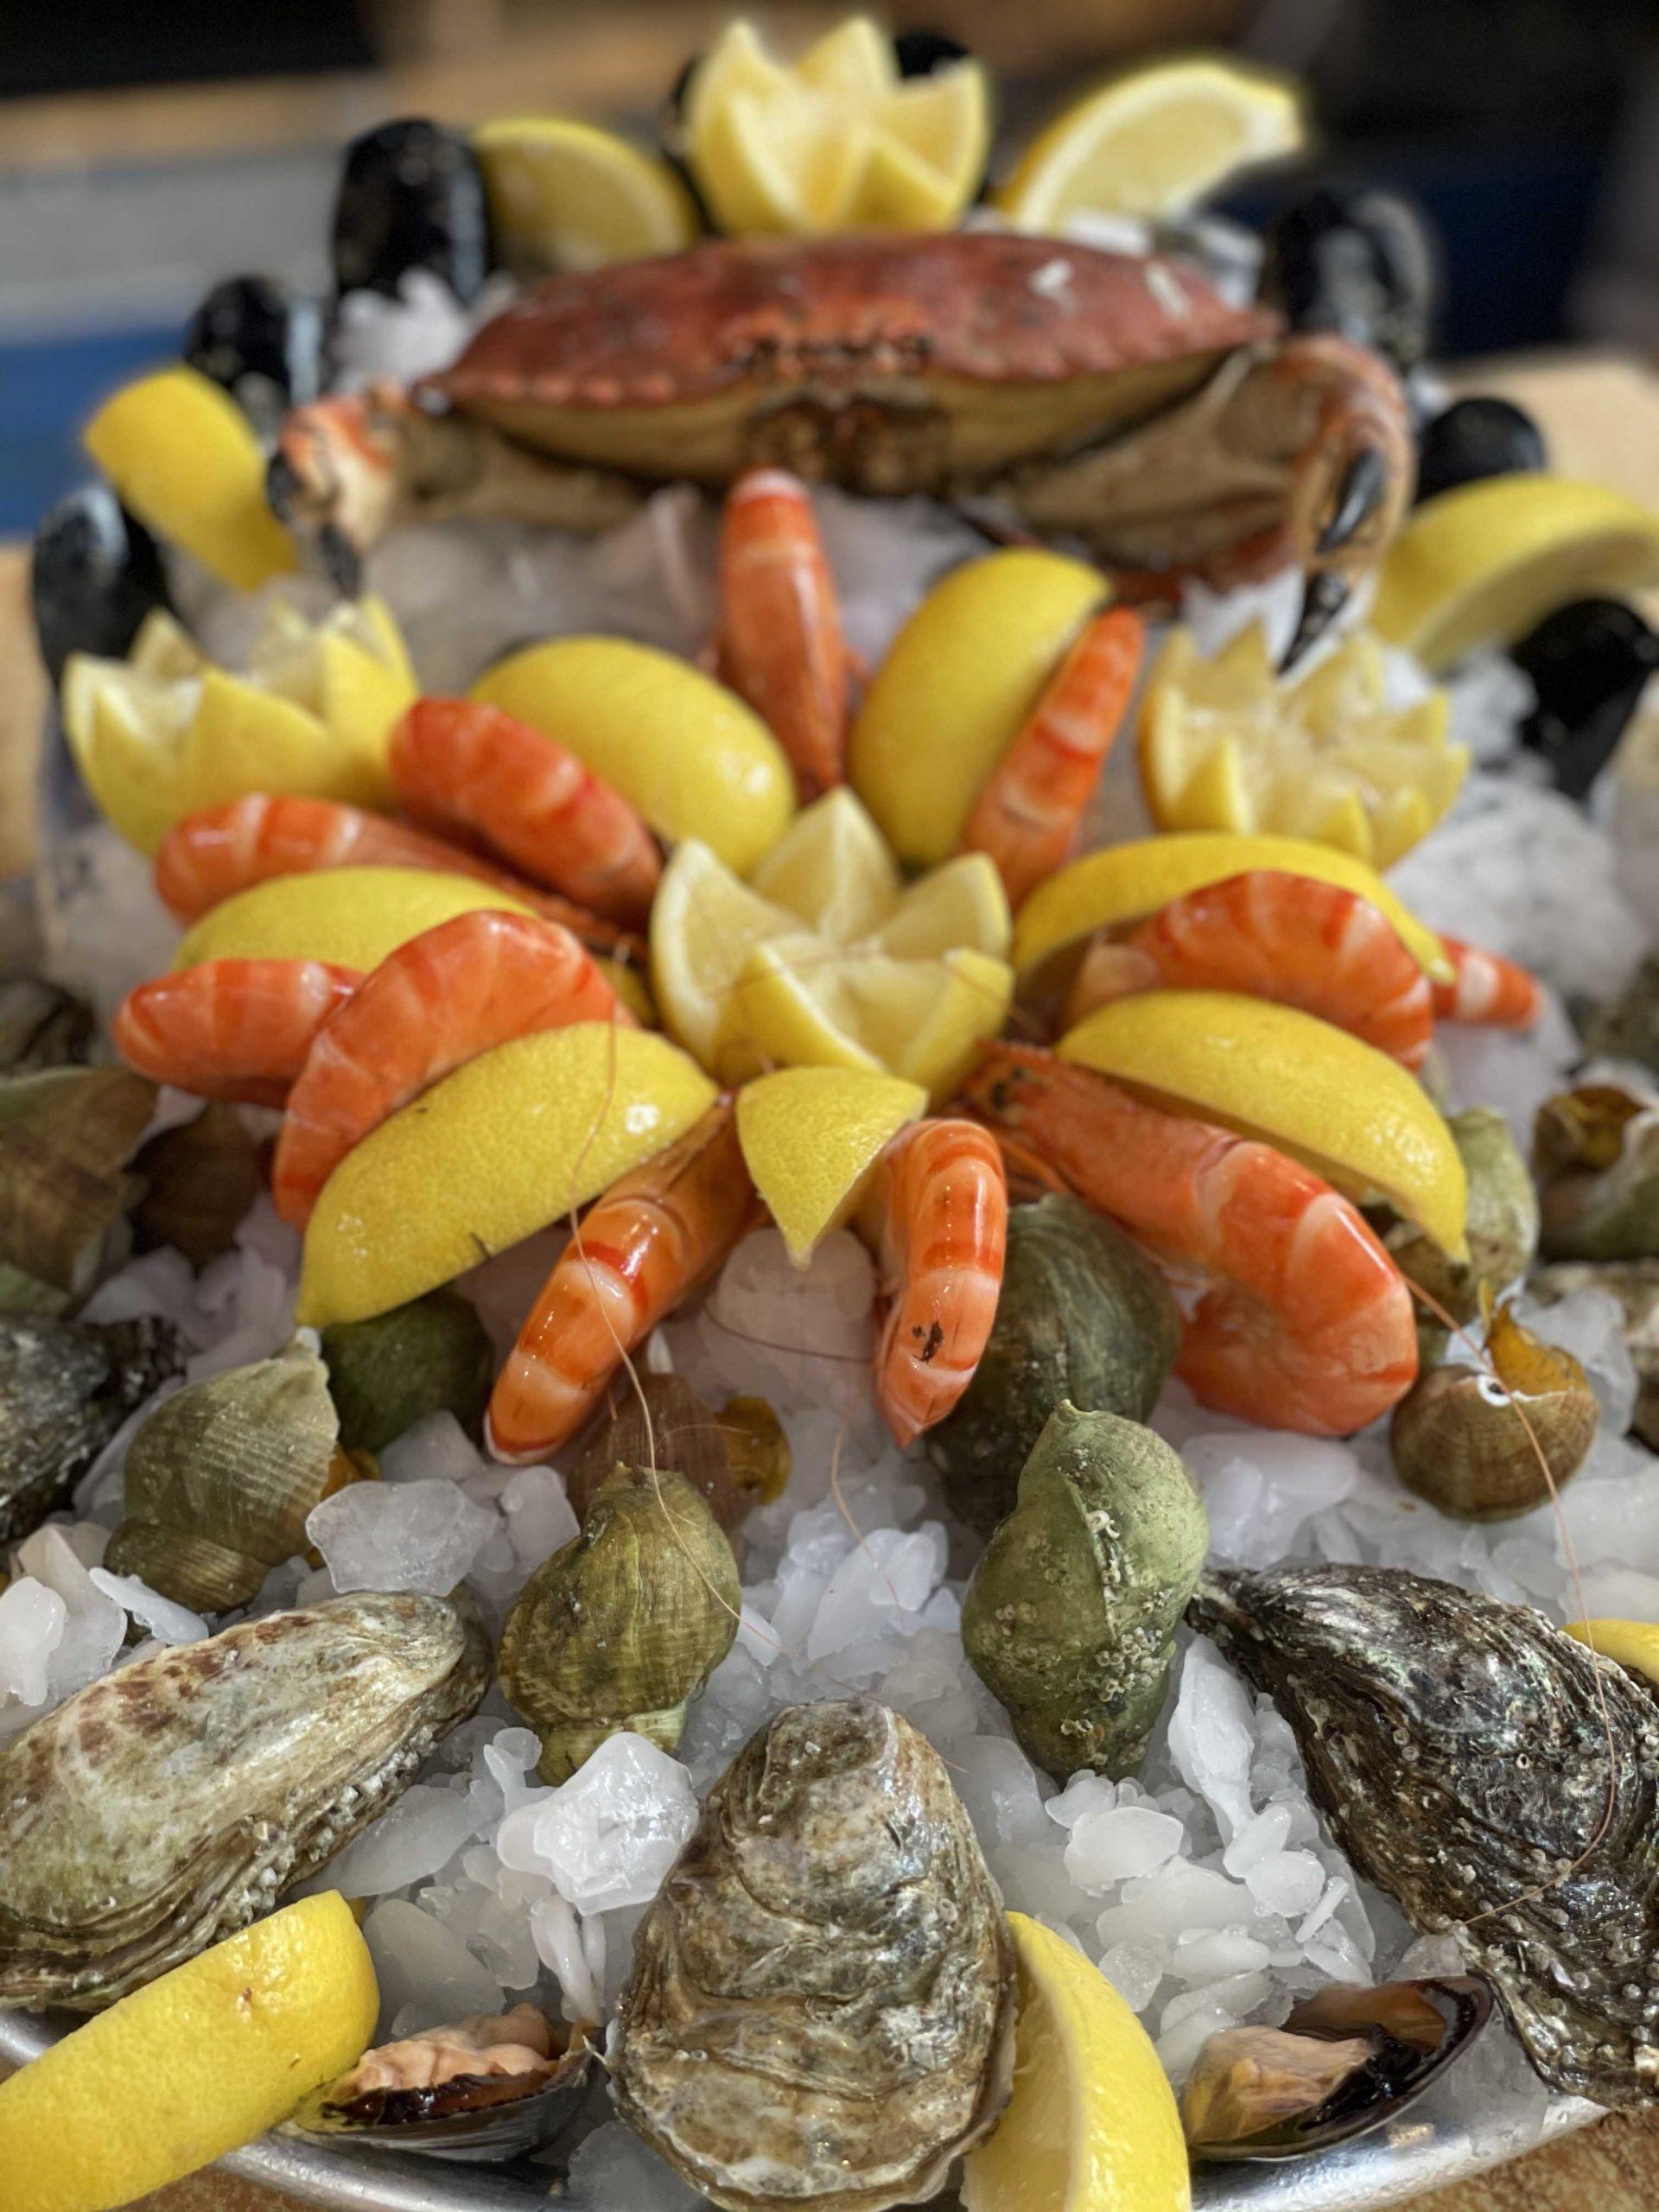 plateau de fruits de mer - Iode - Lyon- restarant de poisson(1)